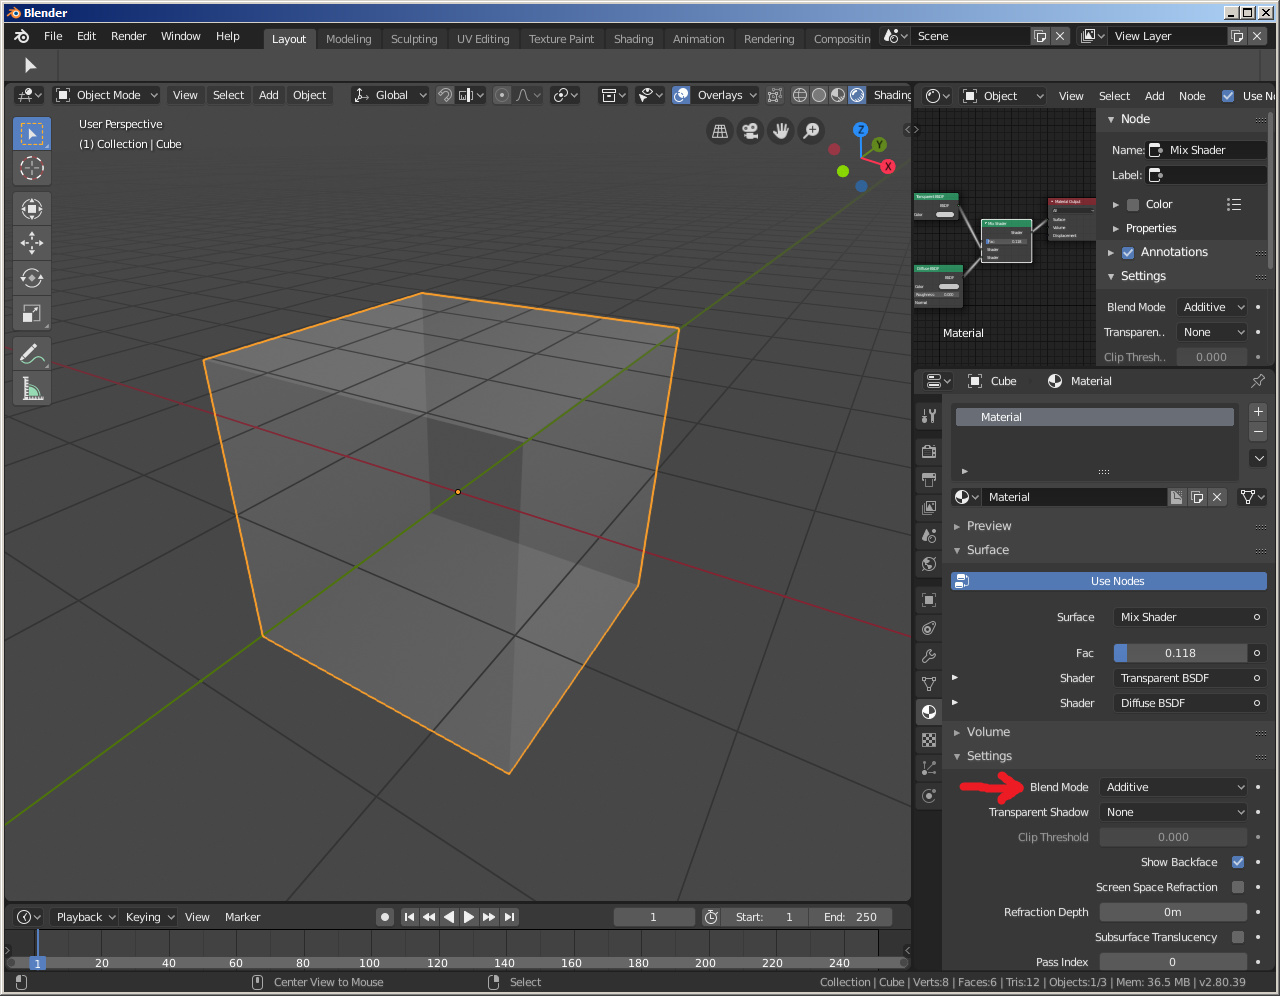 Blender 2 8 Transparent GLTF/GLB - Materials and Textures